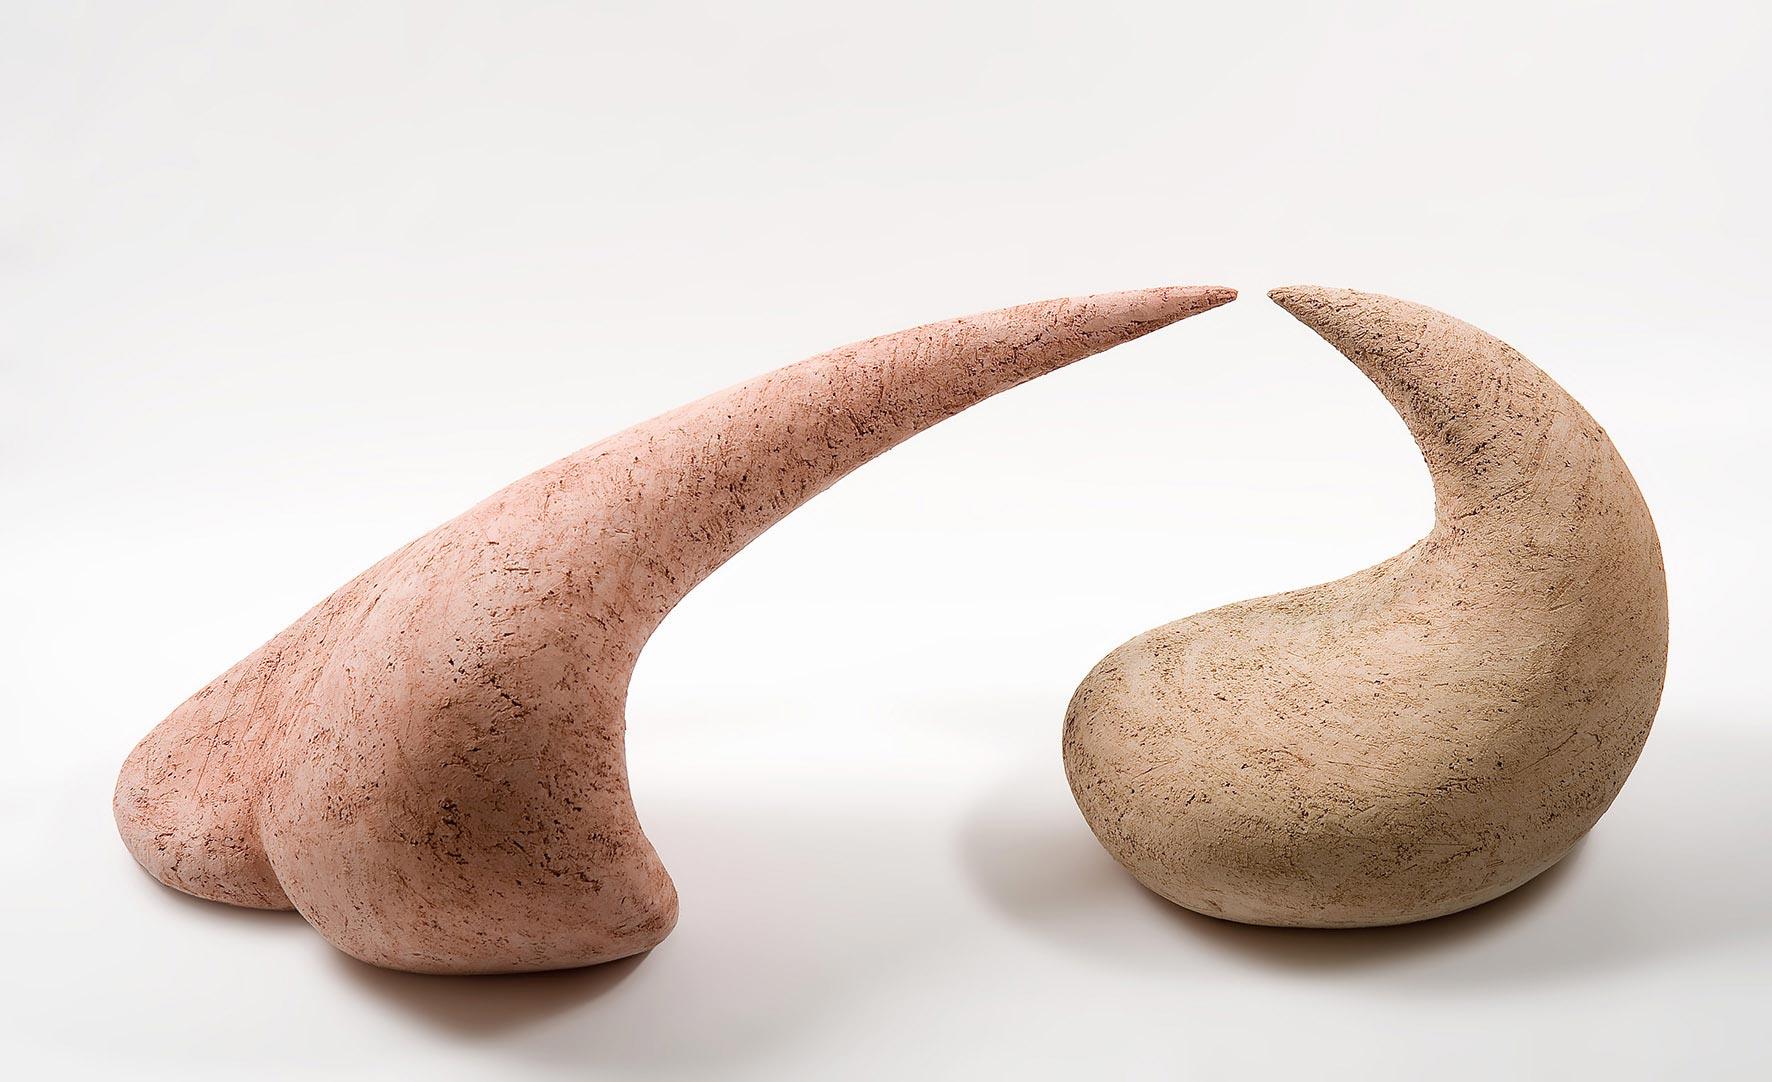 Der Kuss, 2tlg., Keramik, 100/35/33 cm